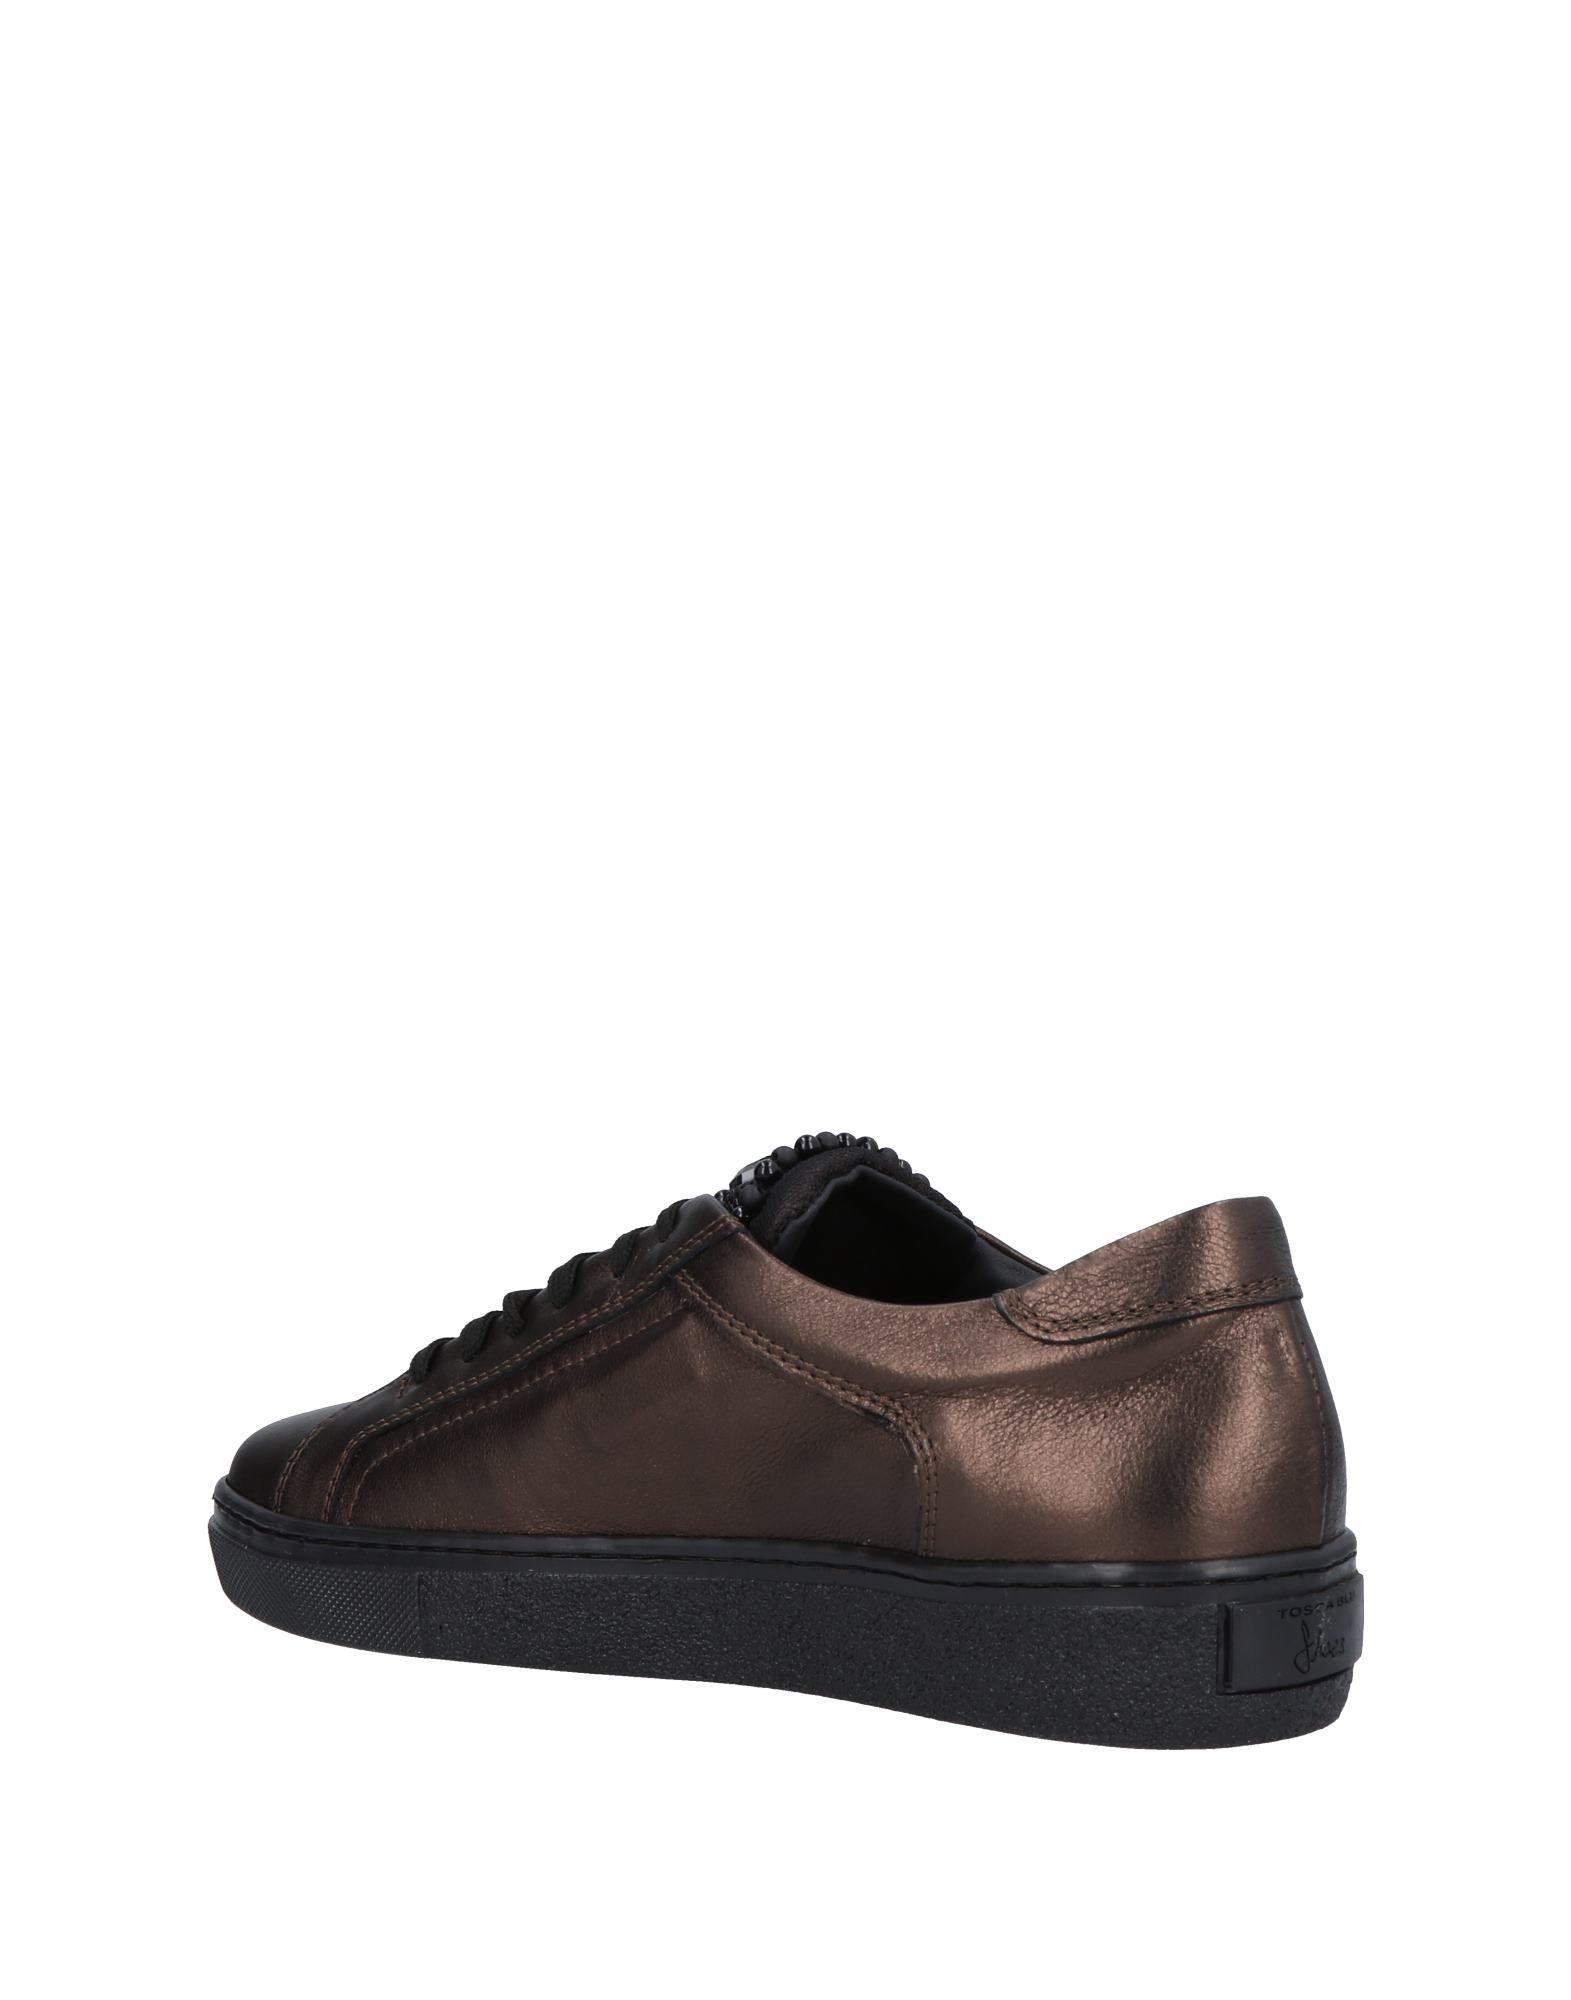 Tosca Blu Schuhes Sneakers es Damen Gutes Preis-Leistungs-Verhältnis, es Sneakers lohnt sich 5c57b3